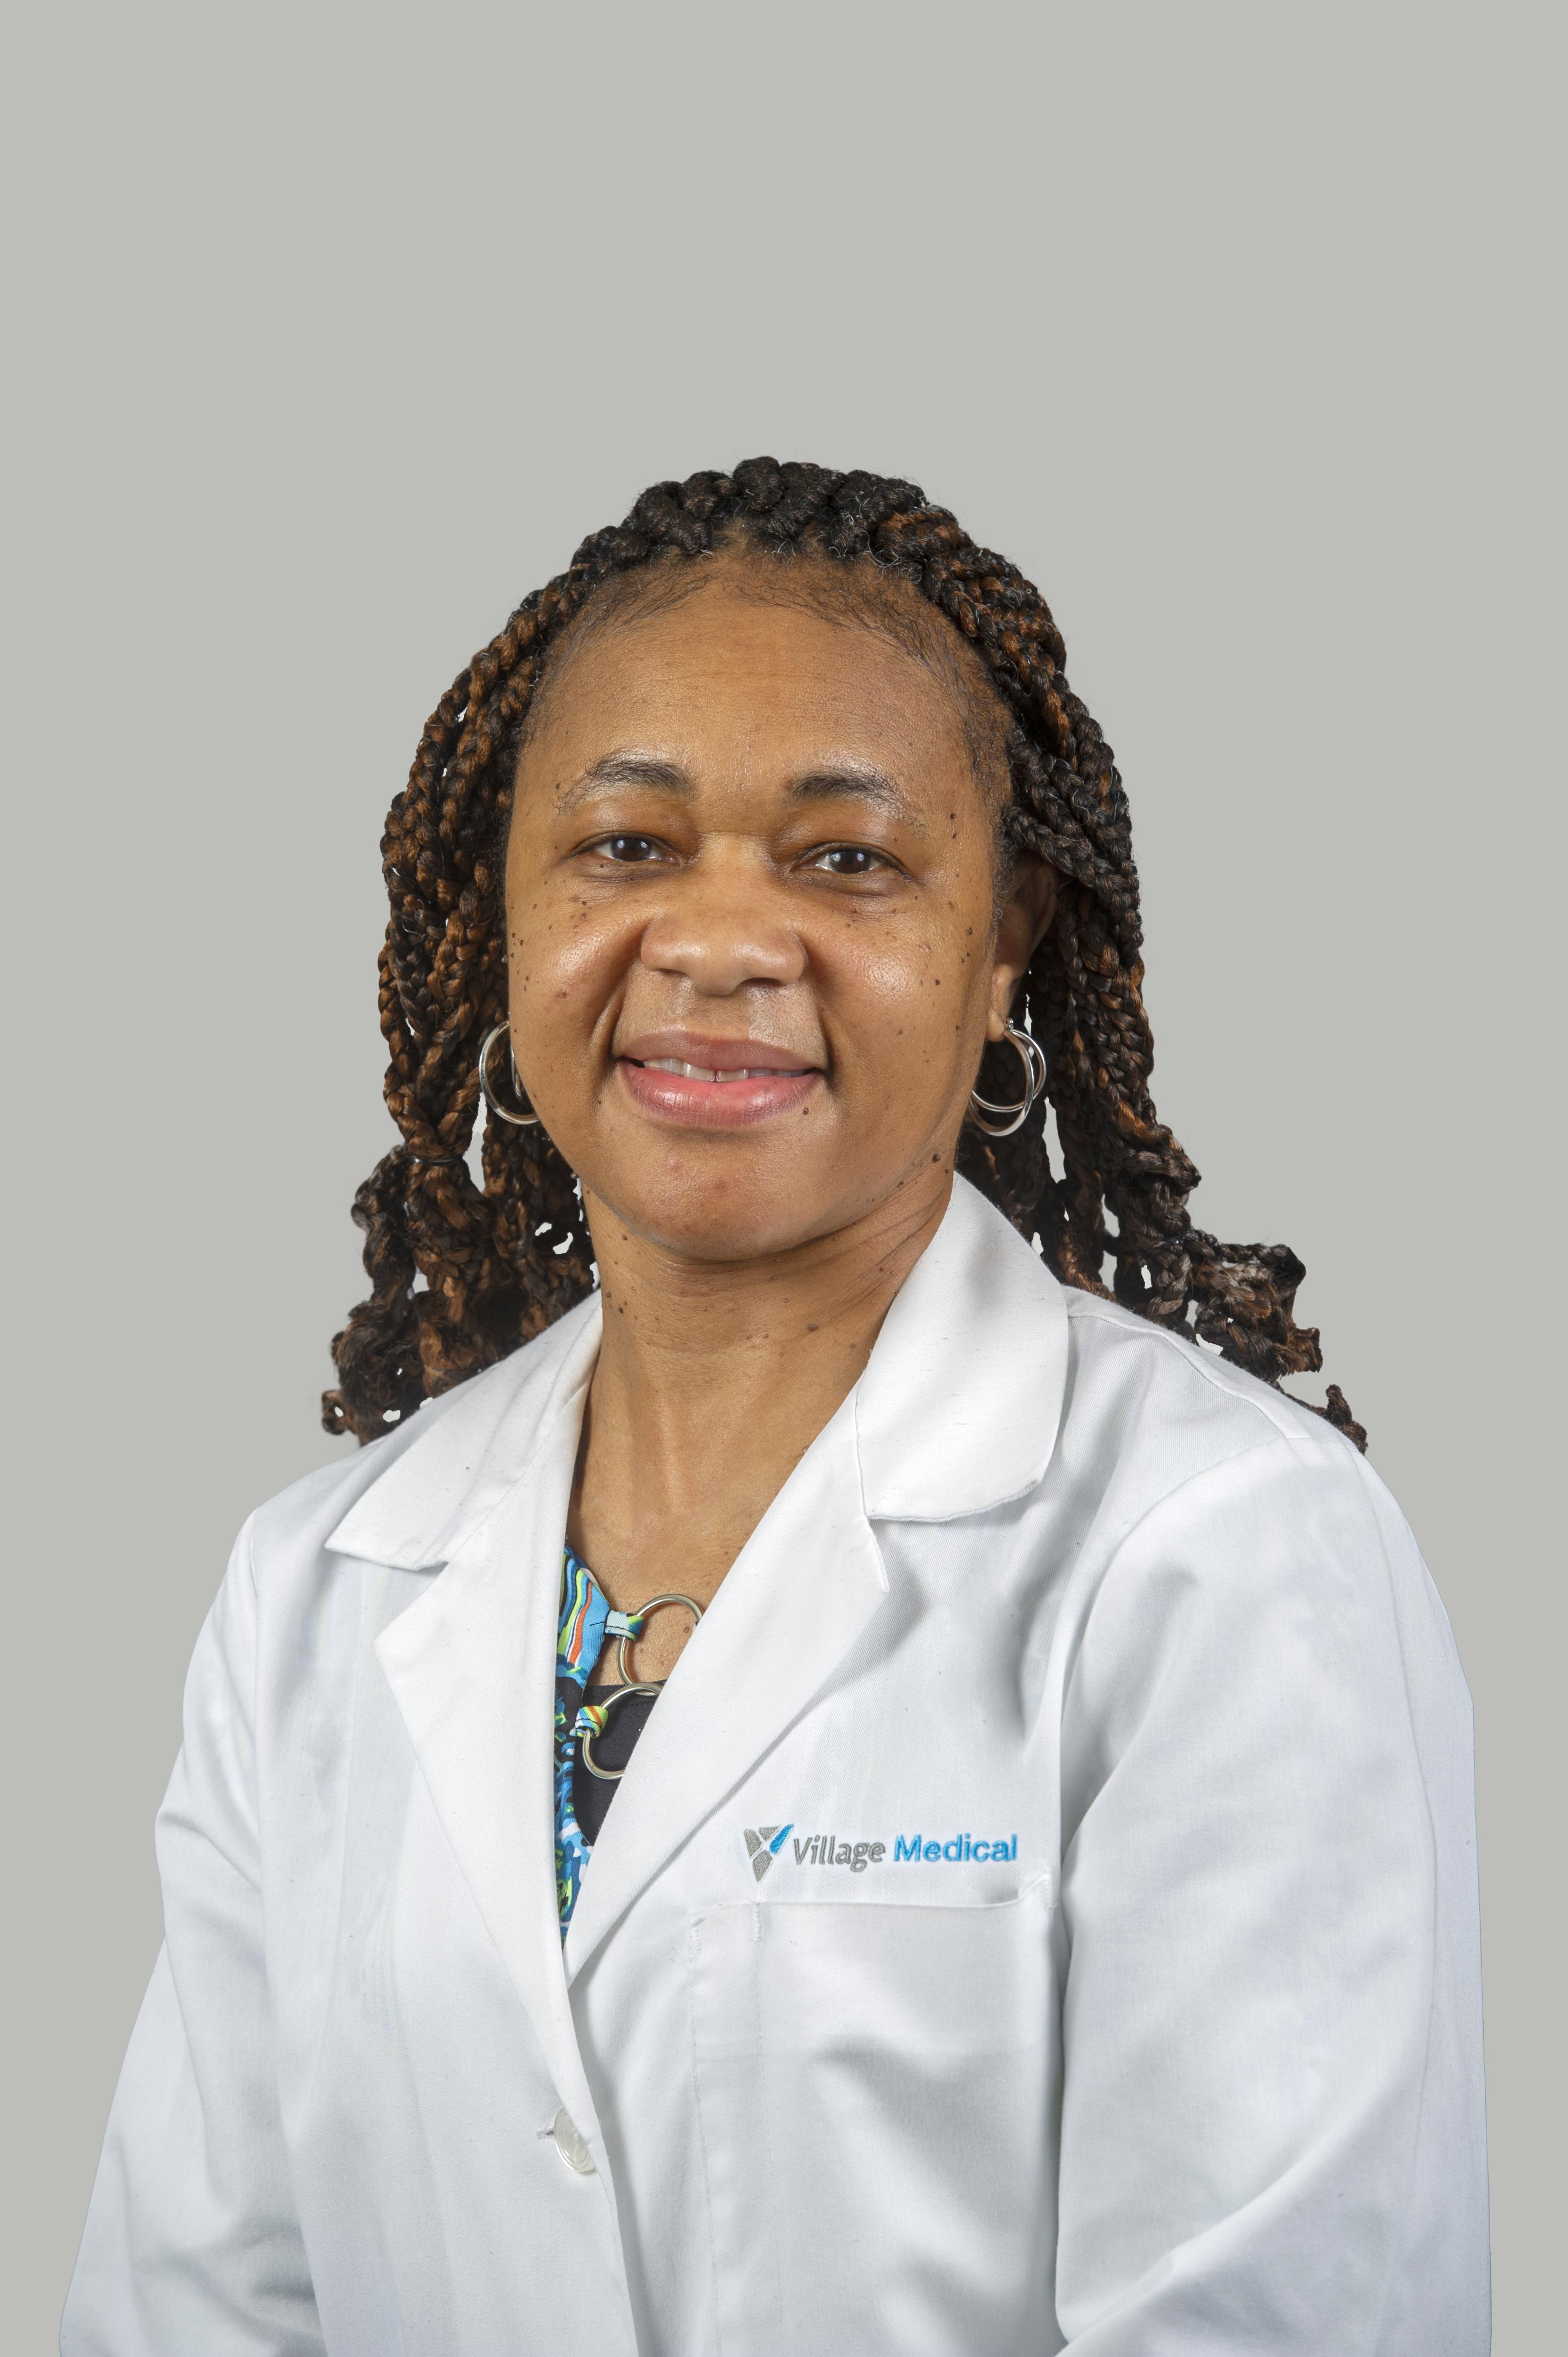 Sharon Smith, MD, FACOG